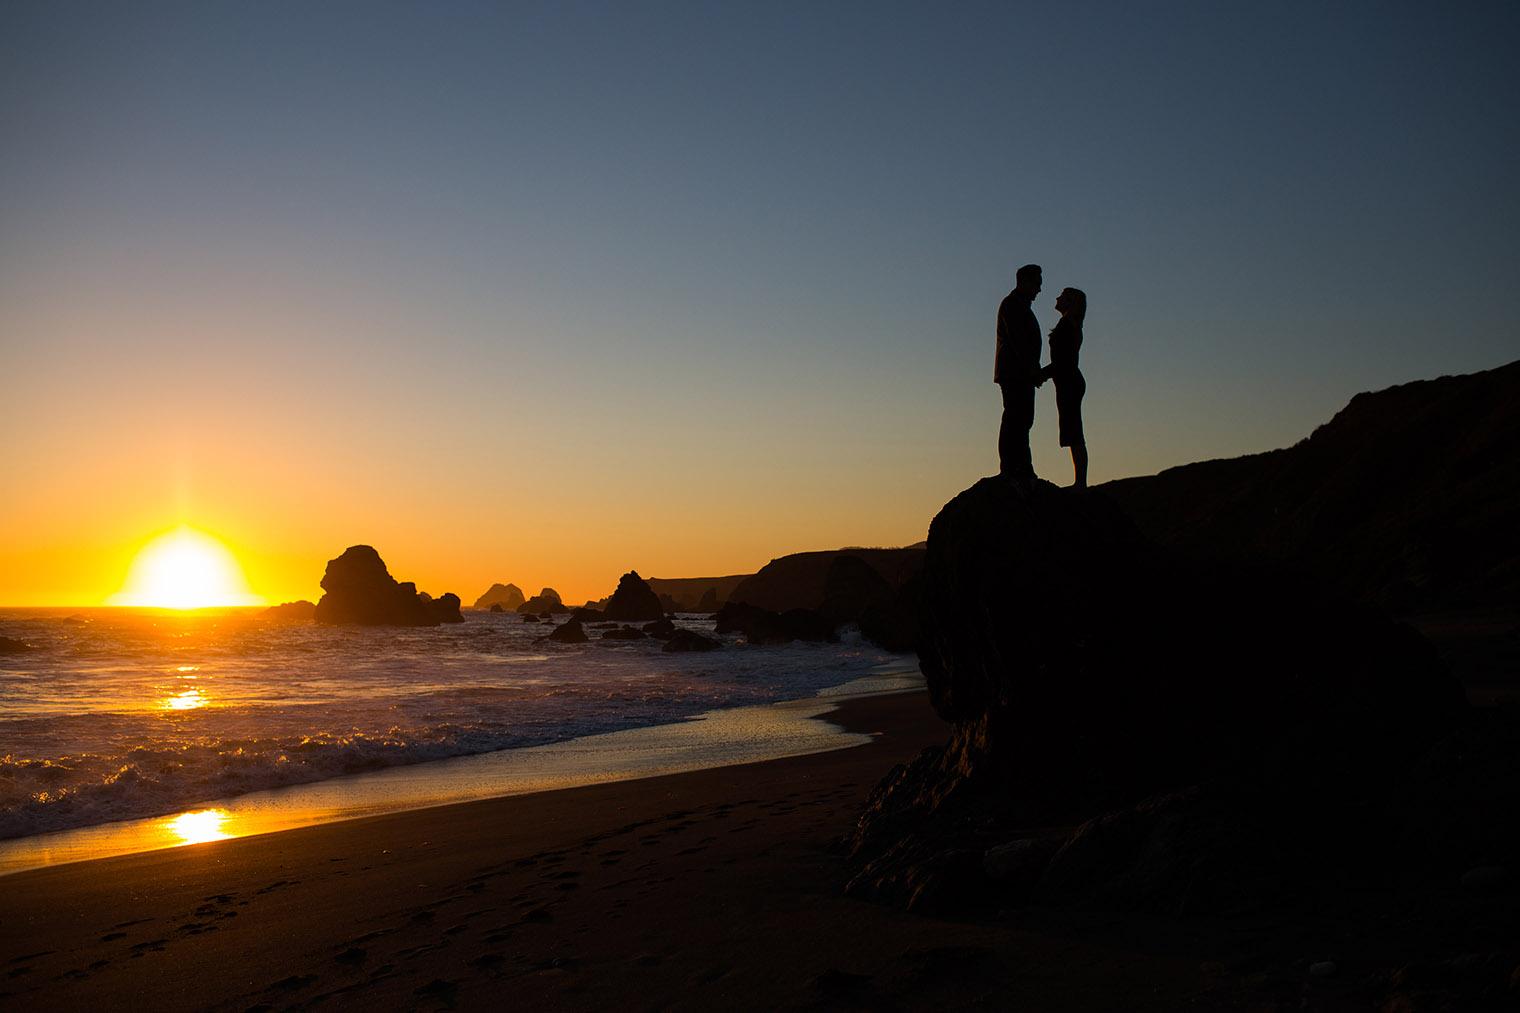 wedding photographer located in santa rosa, ca